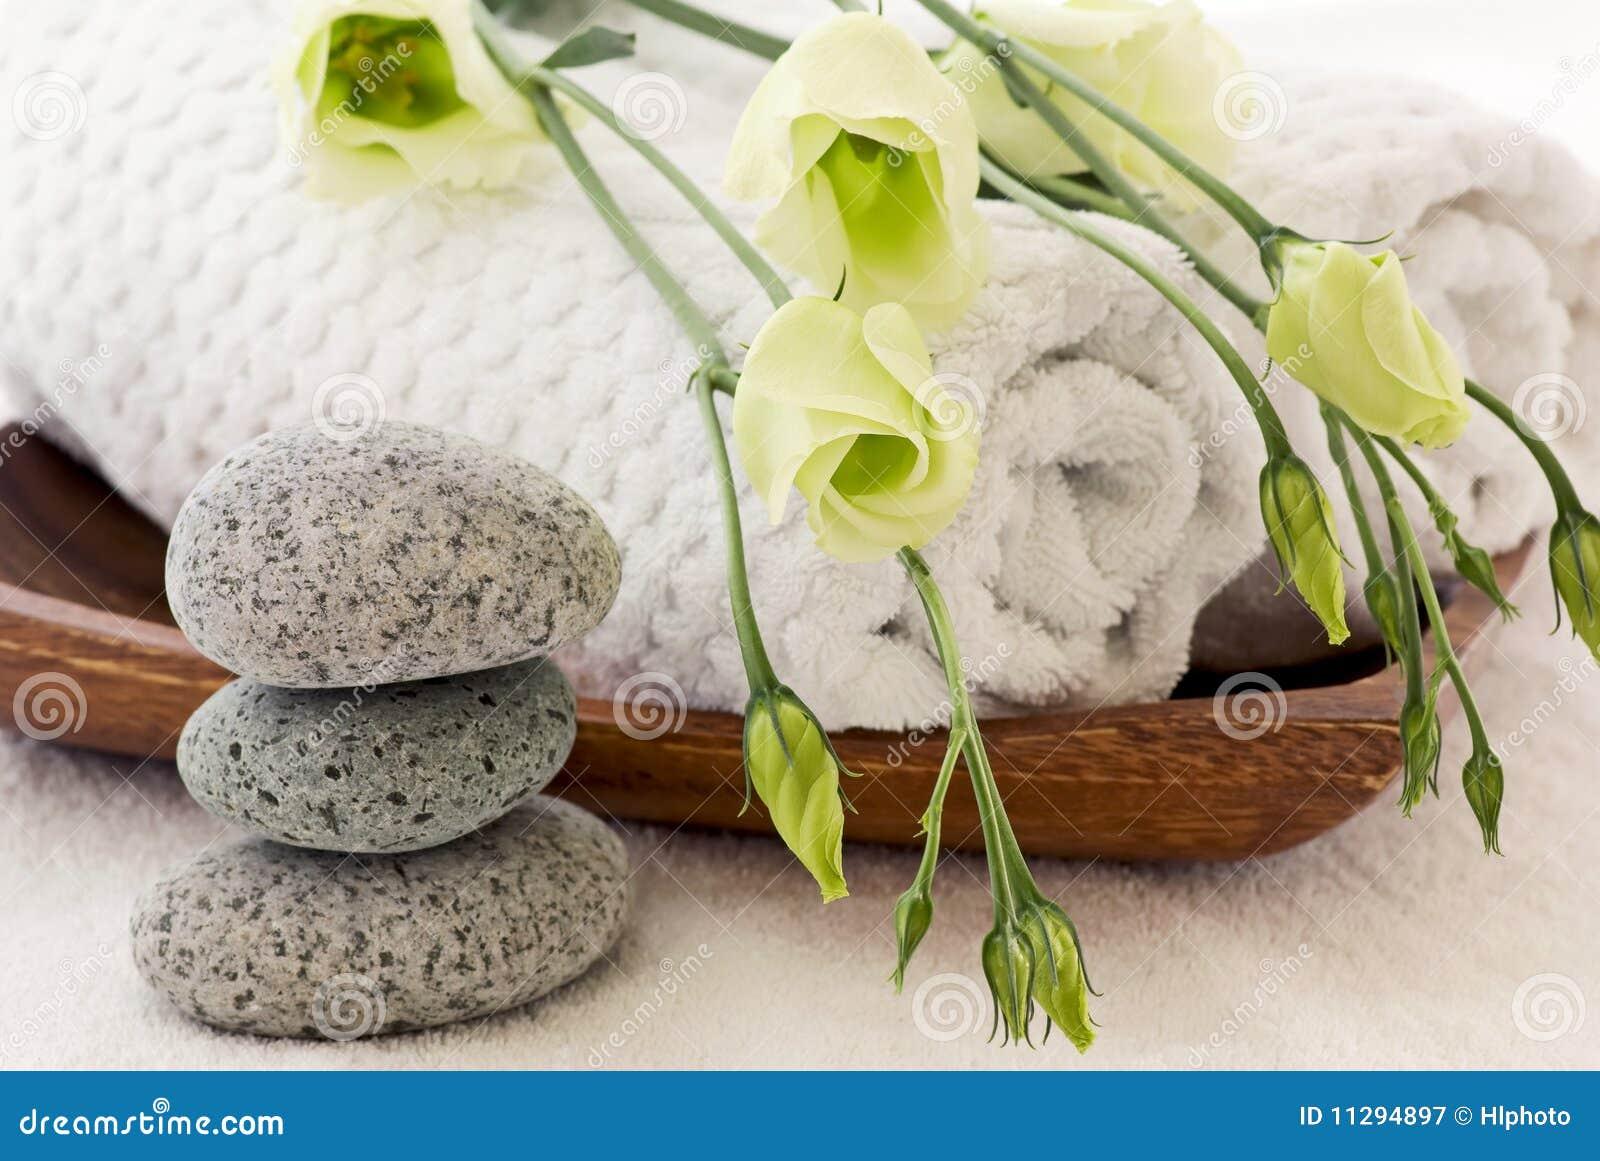 Wellness Dekoration Lizenzfreie Stockfotografie Bild